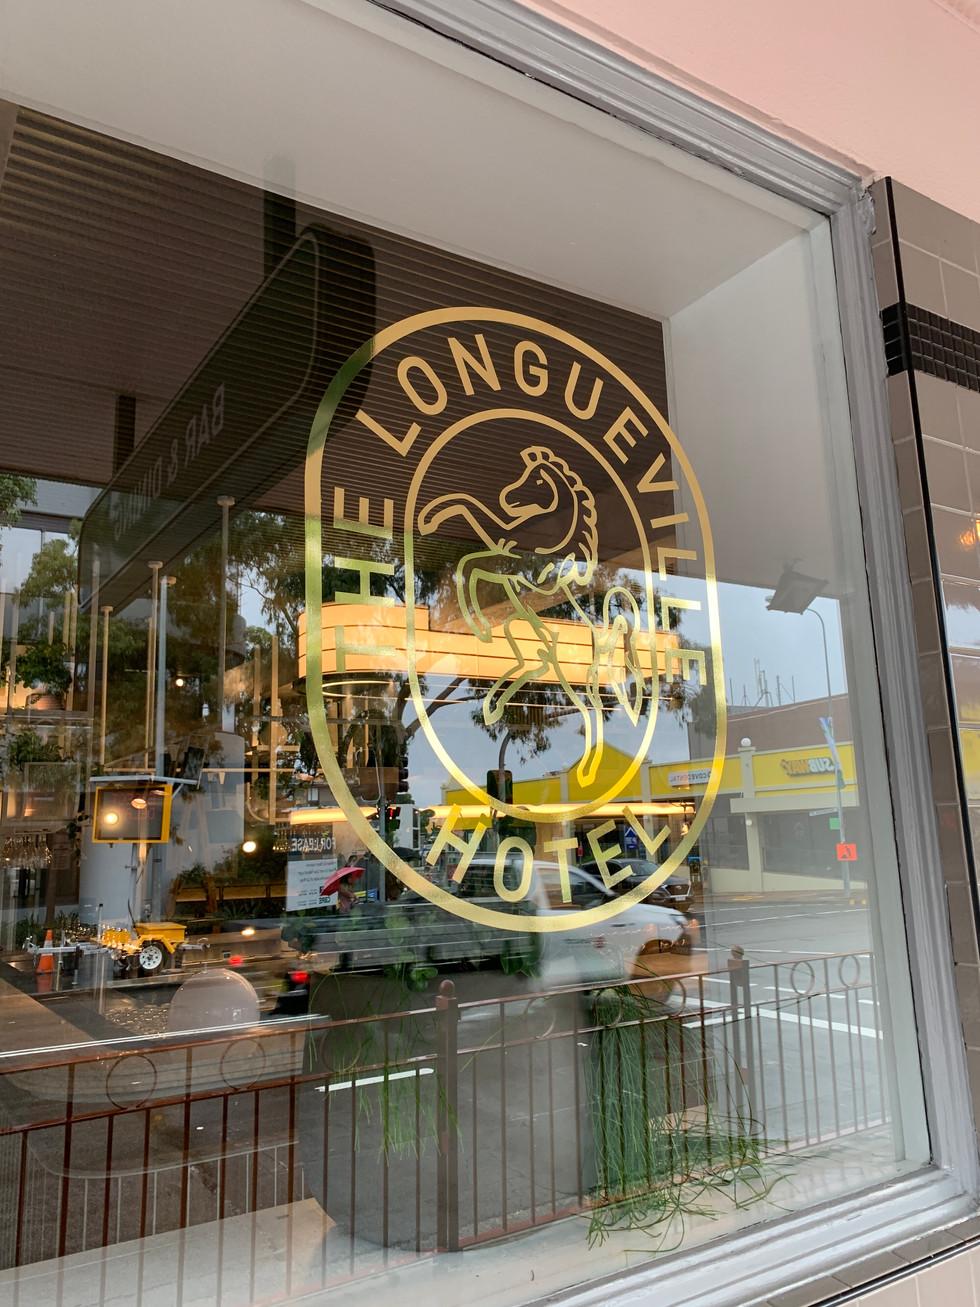 Longueville Hotel - Gold Vinyl.JPG